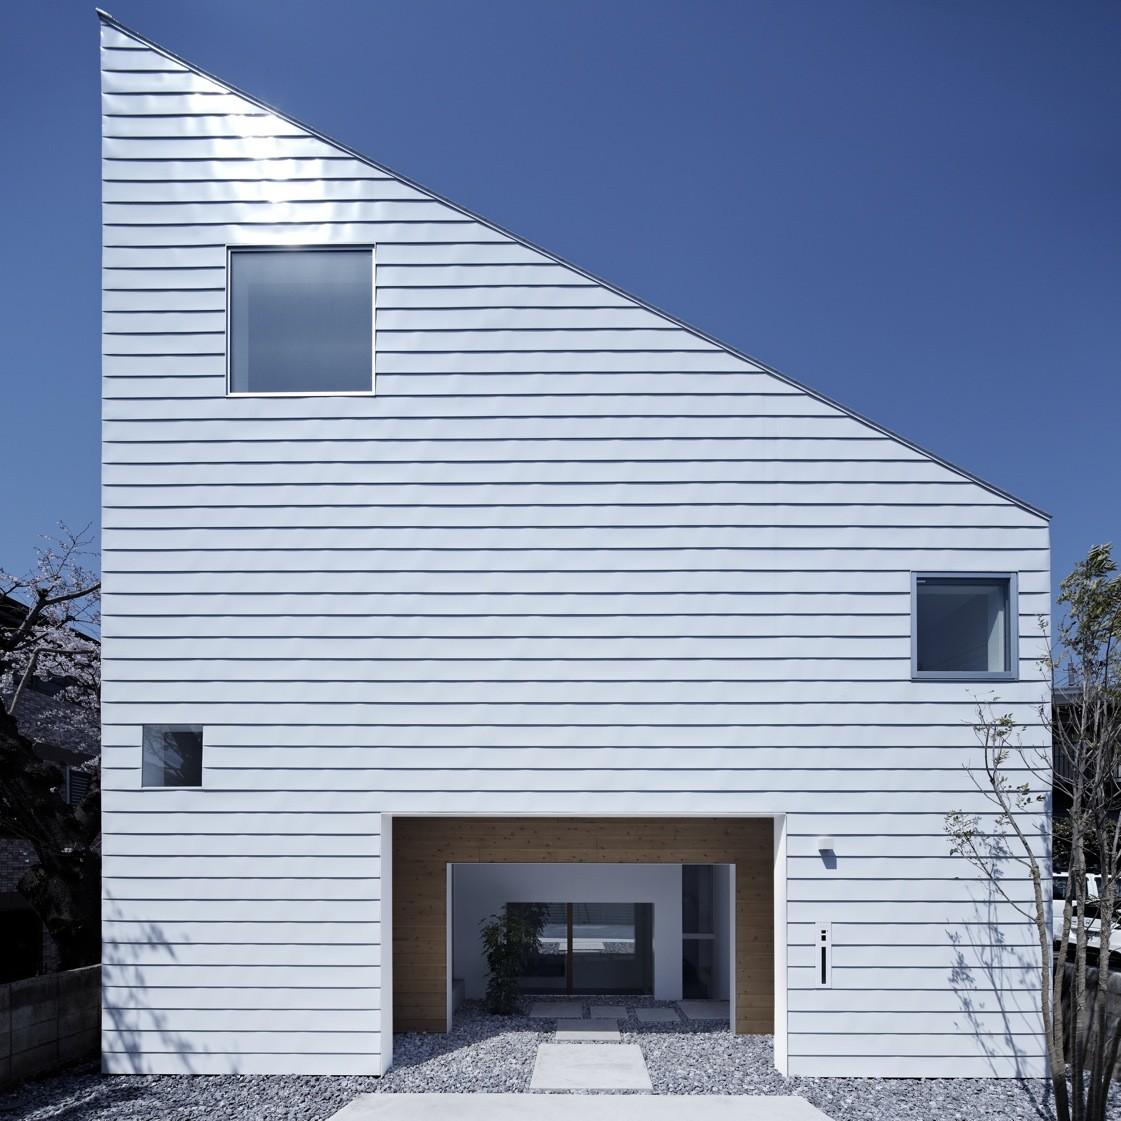 House in Shimoda-Chou / EANA, © Koichi Torimura